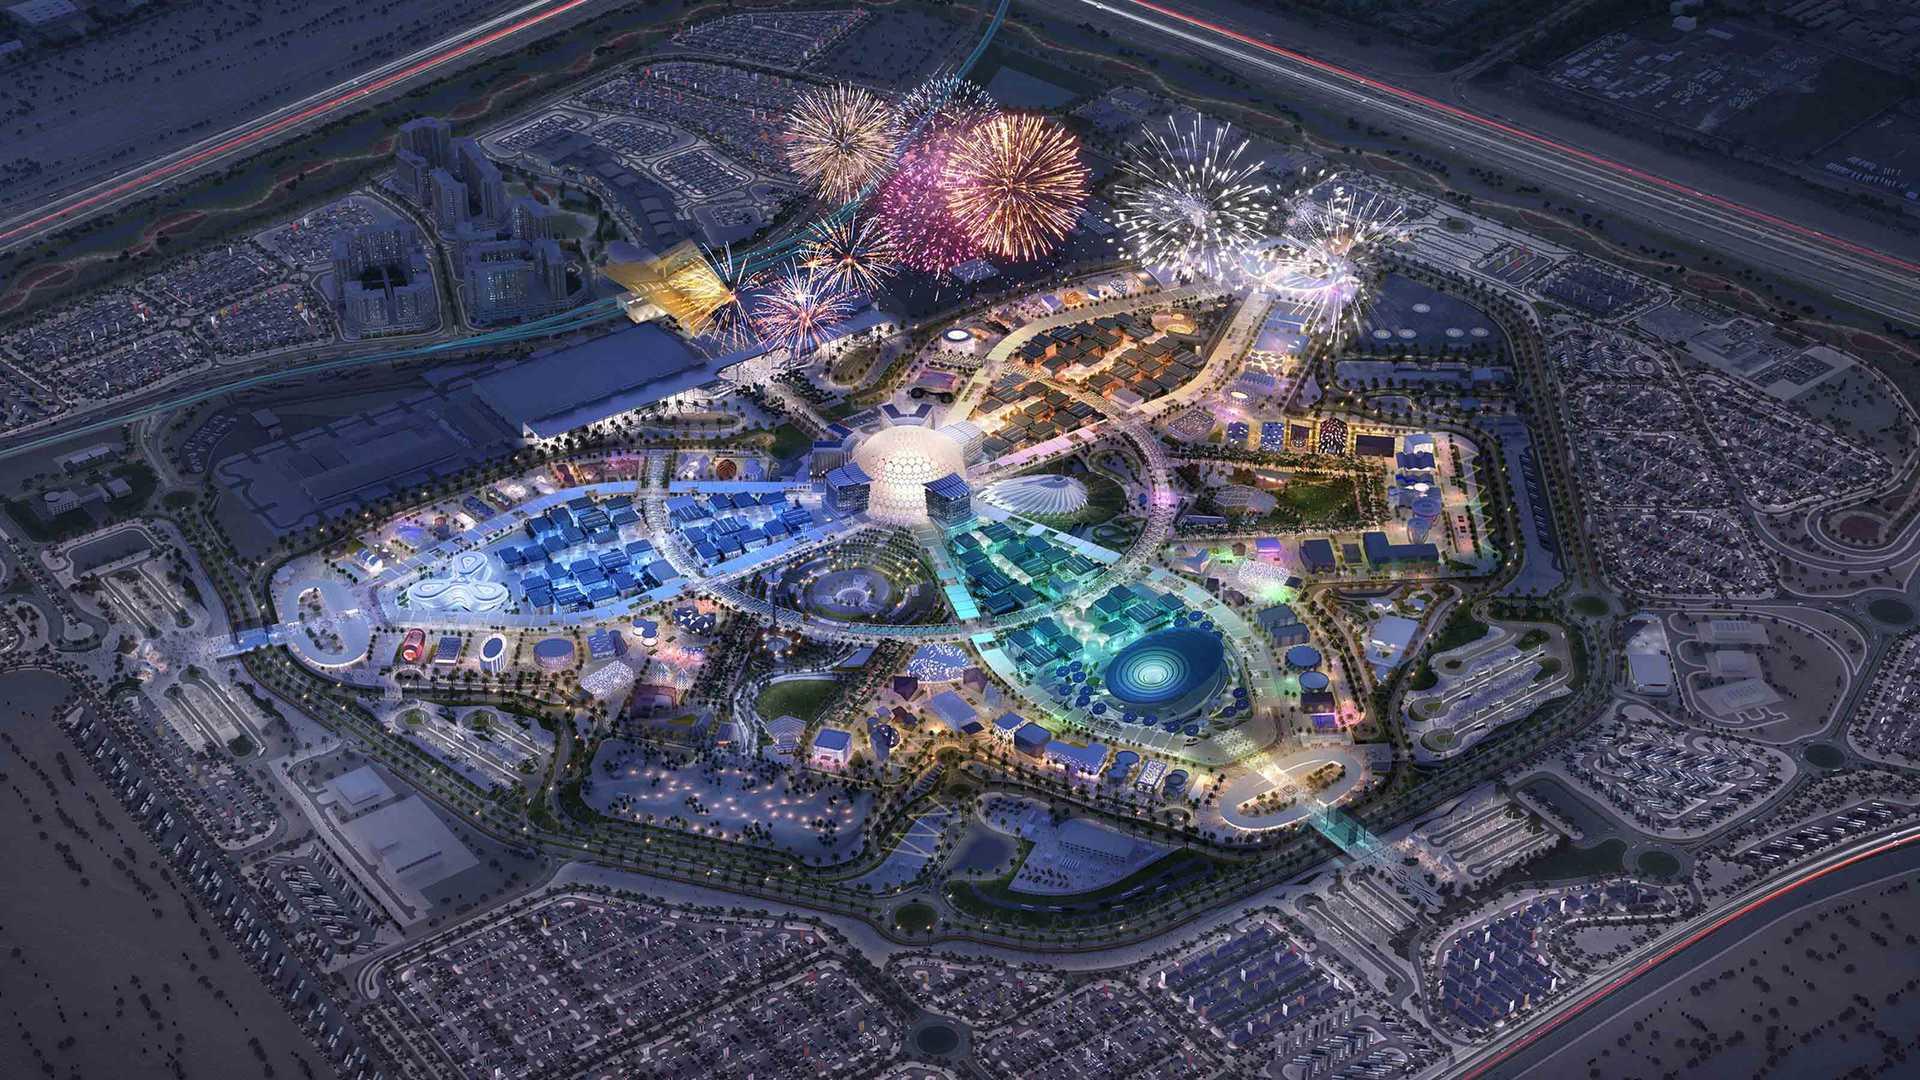 Dubai Exhibition Centre Dubai